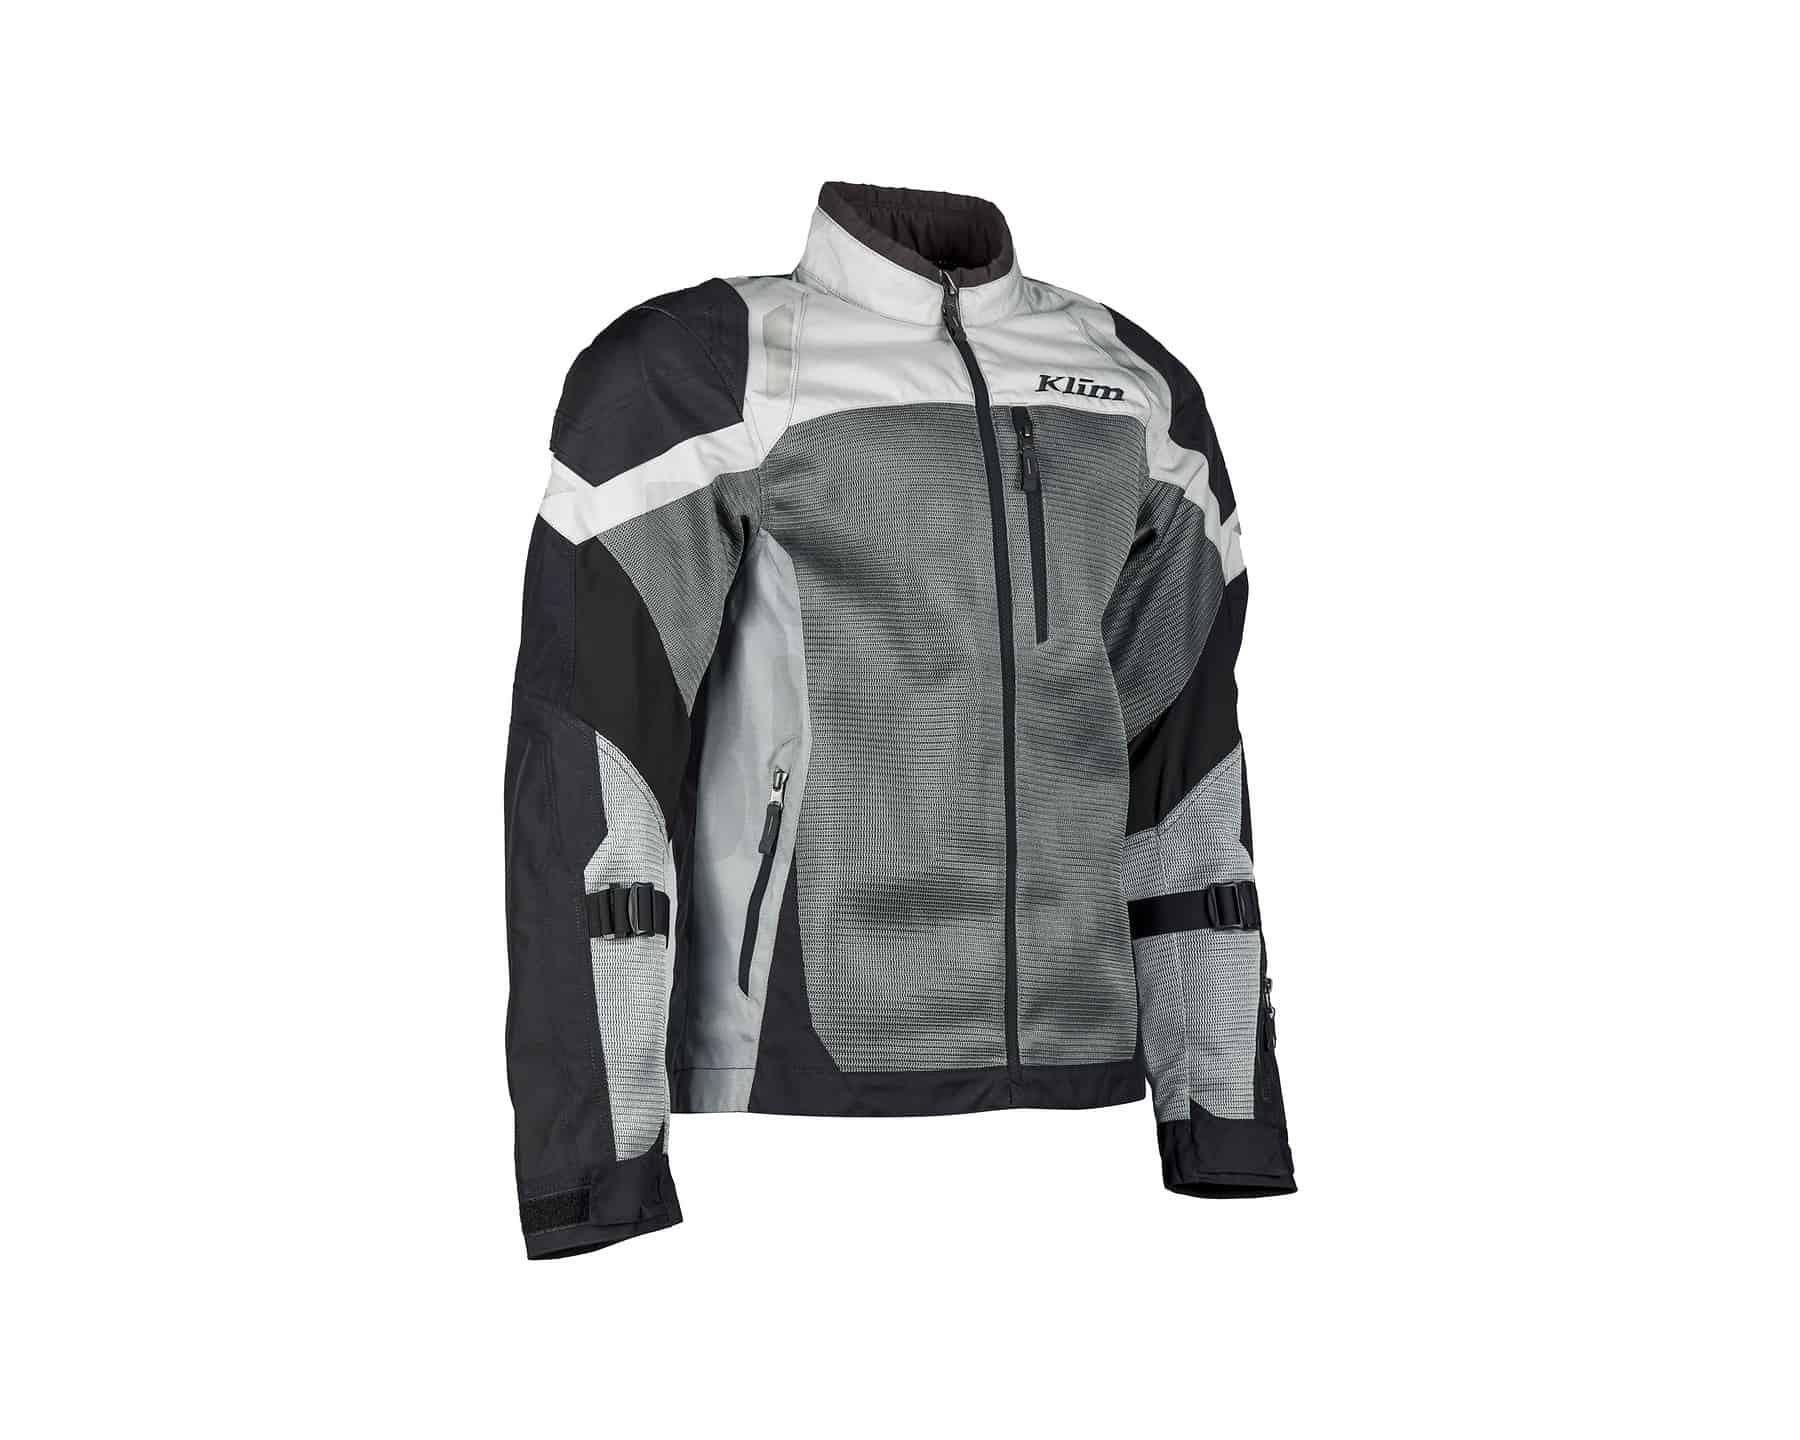 Induction Jacket_5060-002_Light Gray_03